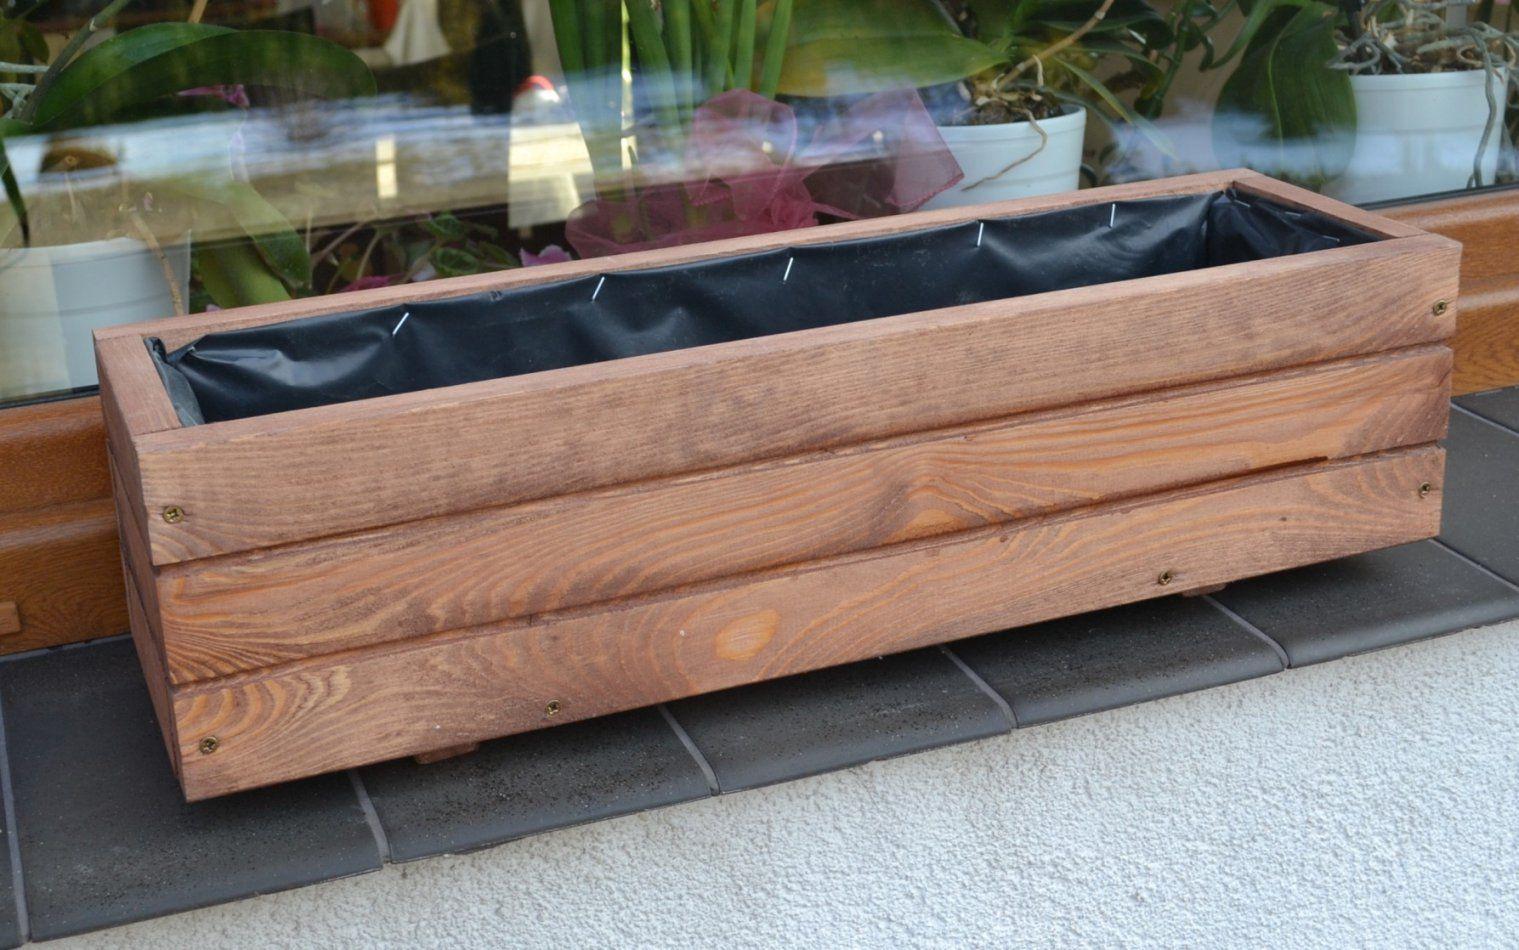 Pflanzkübel Holz D2 Pflanzkasten 80 100 Cm Xxl ...